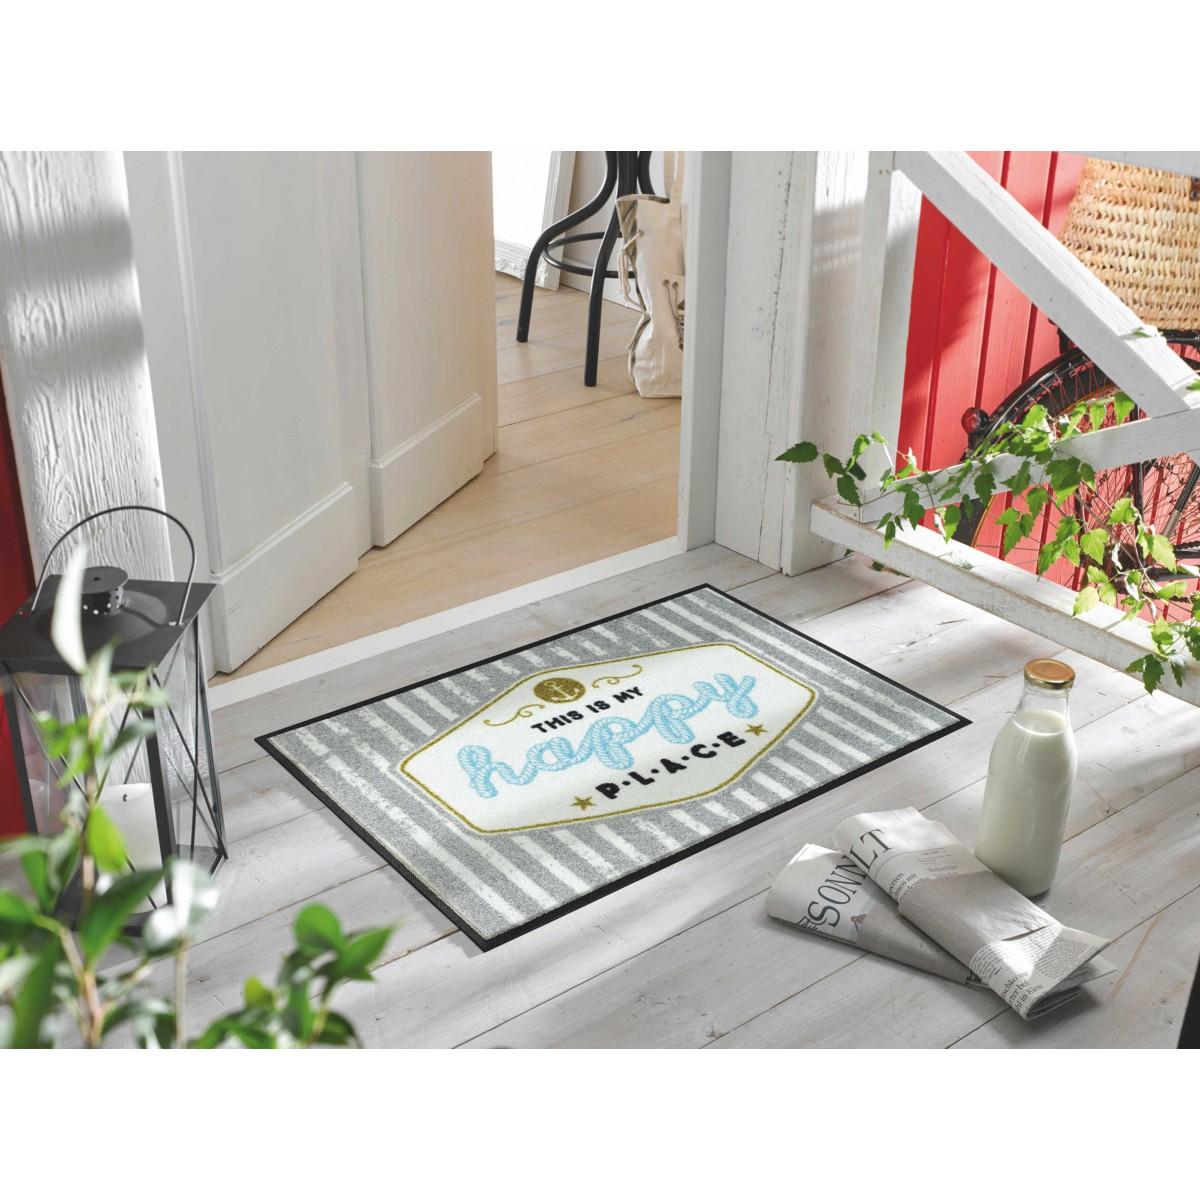 wash dry fu matte happy place kaufen mattenkiste. Black Bedroom Furniture Sets. Home Design Ideas